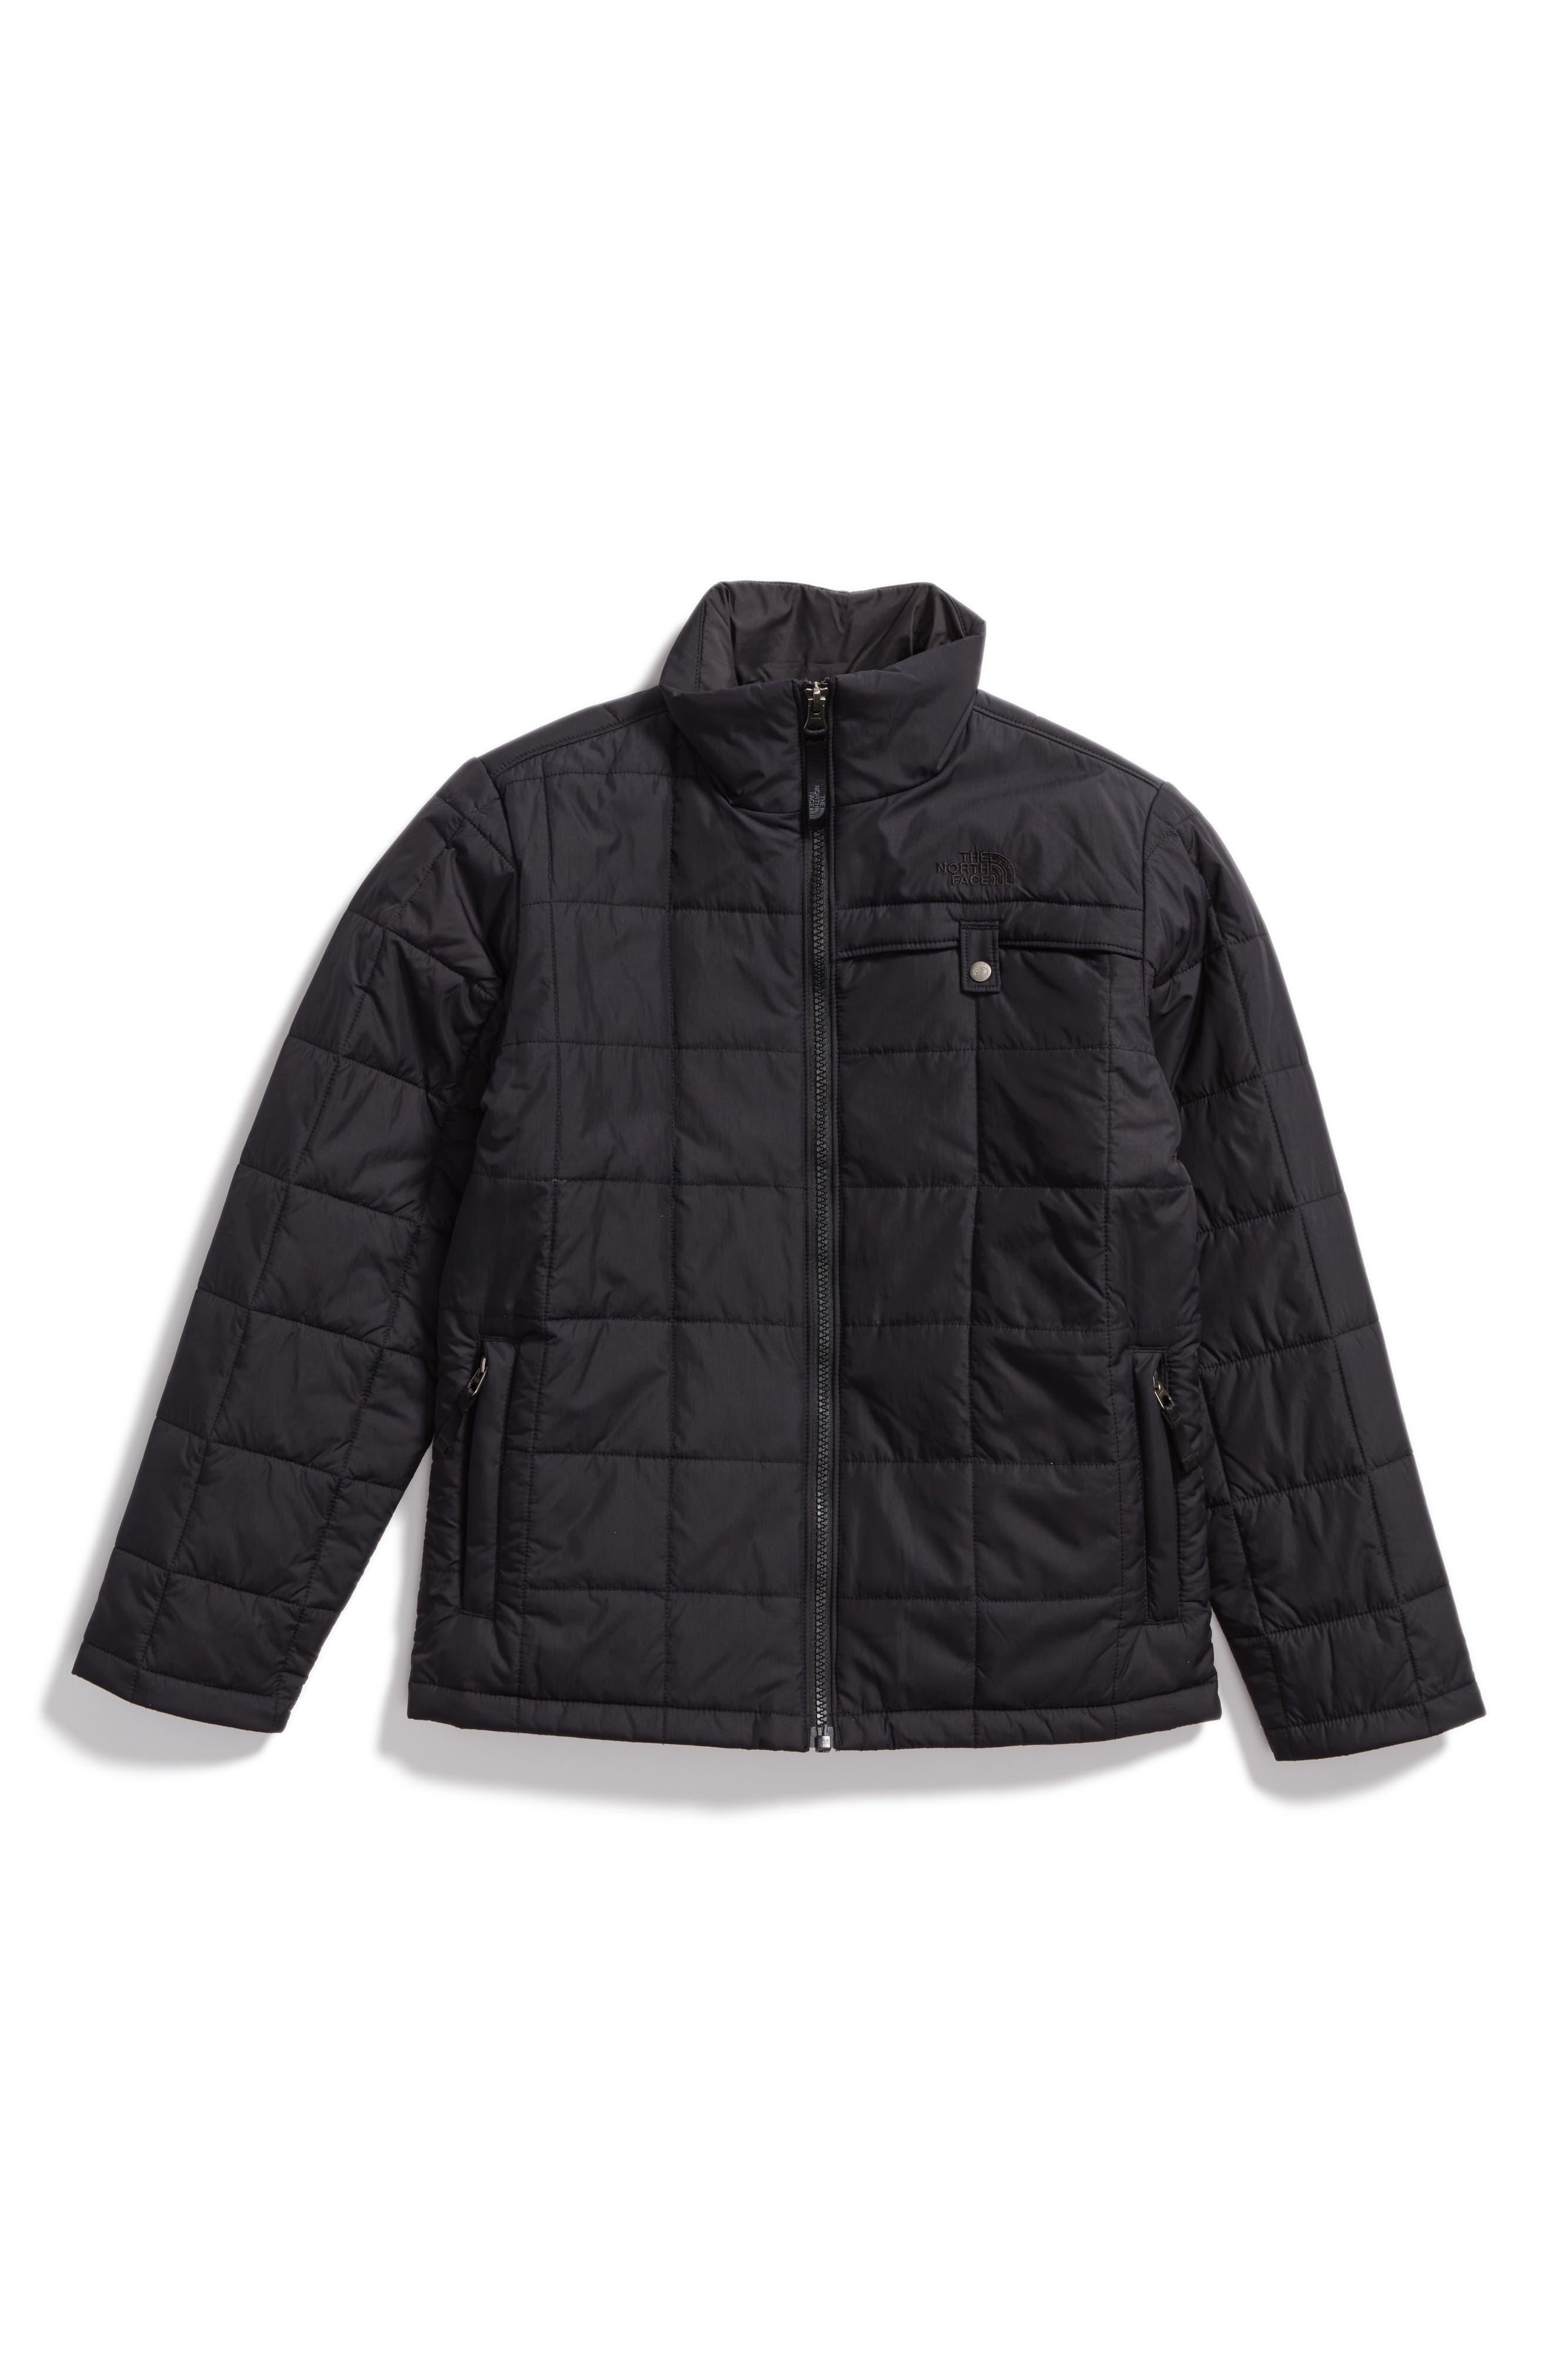 Main Image - The North Face Harway Heatseaker™ Jacket (Big Boys)